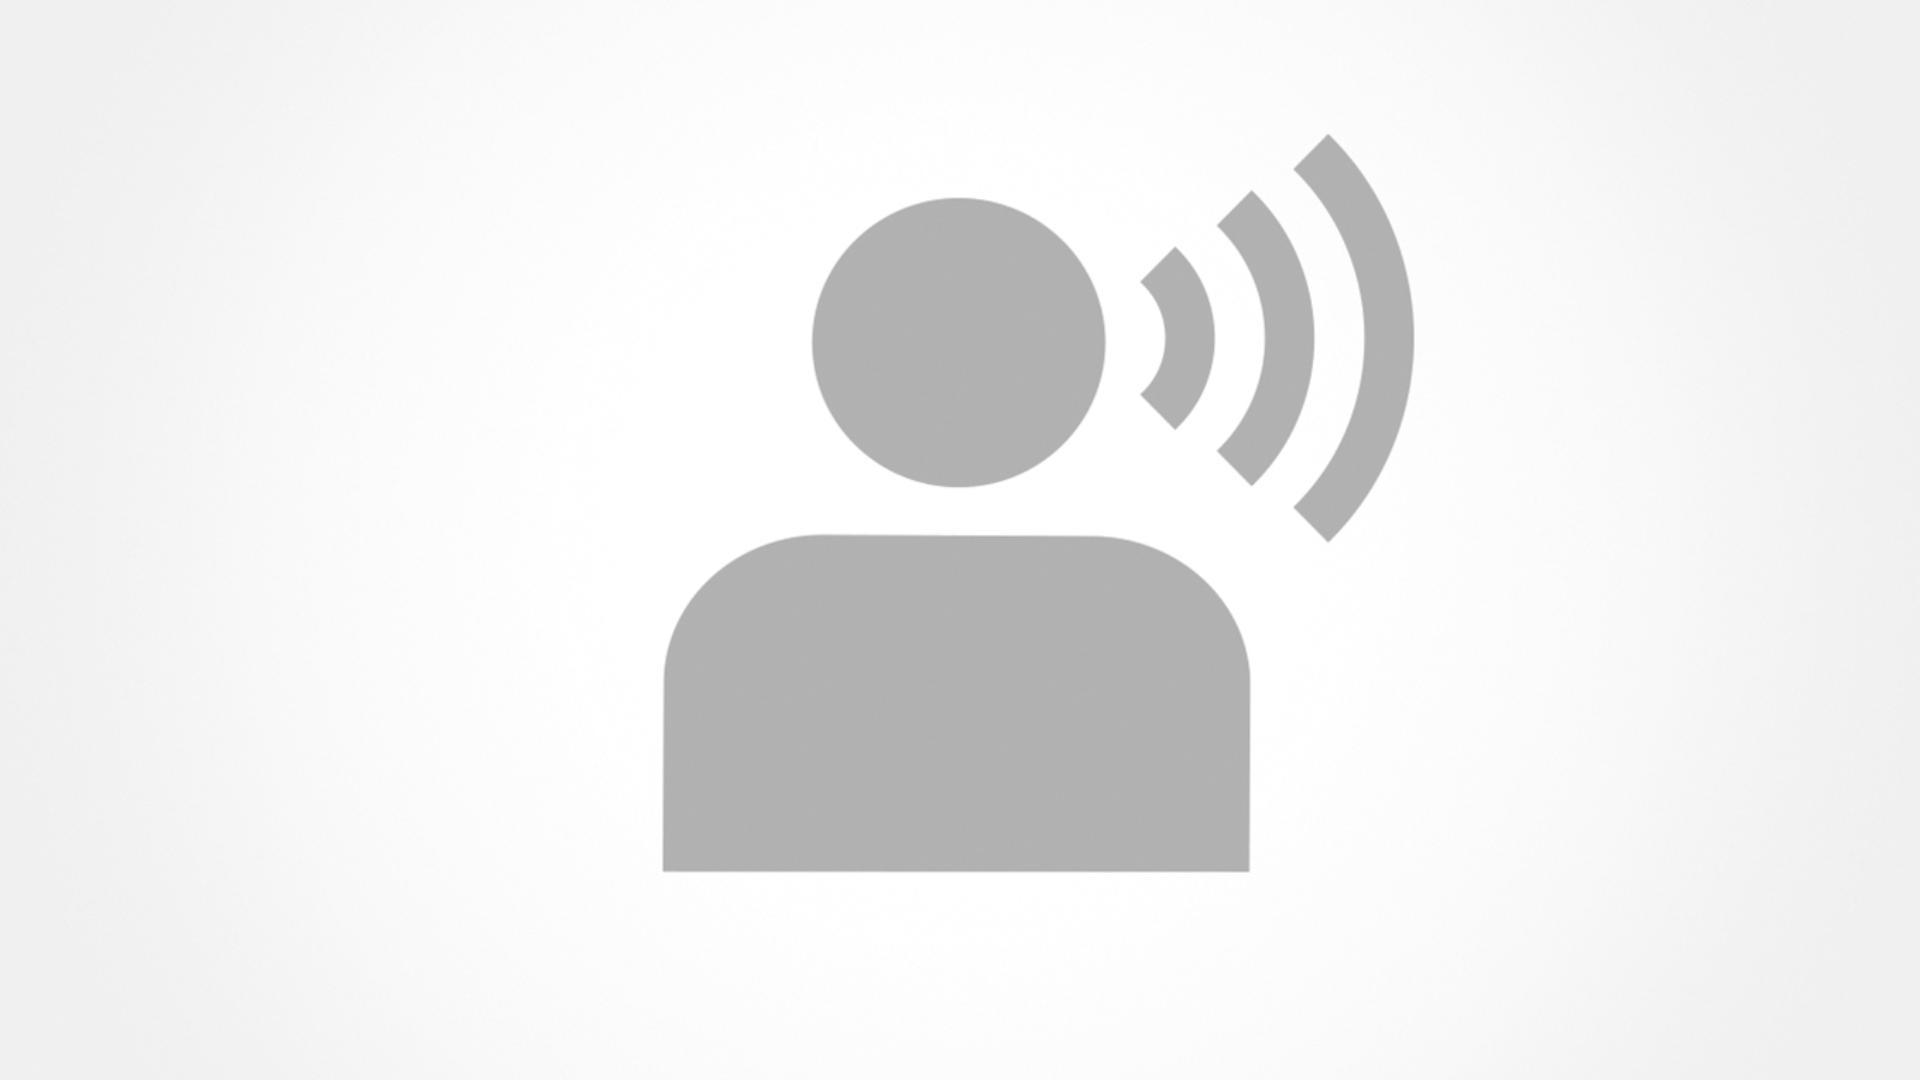 Voice control icon